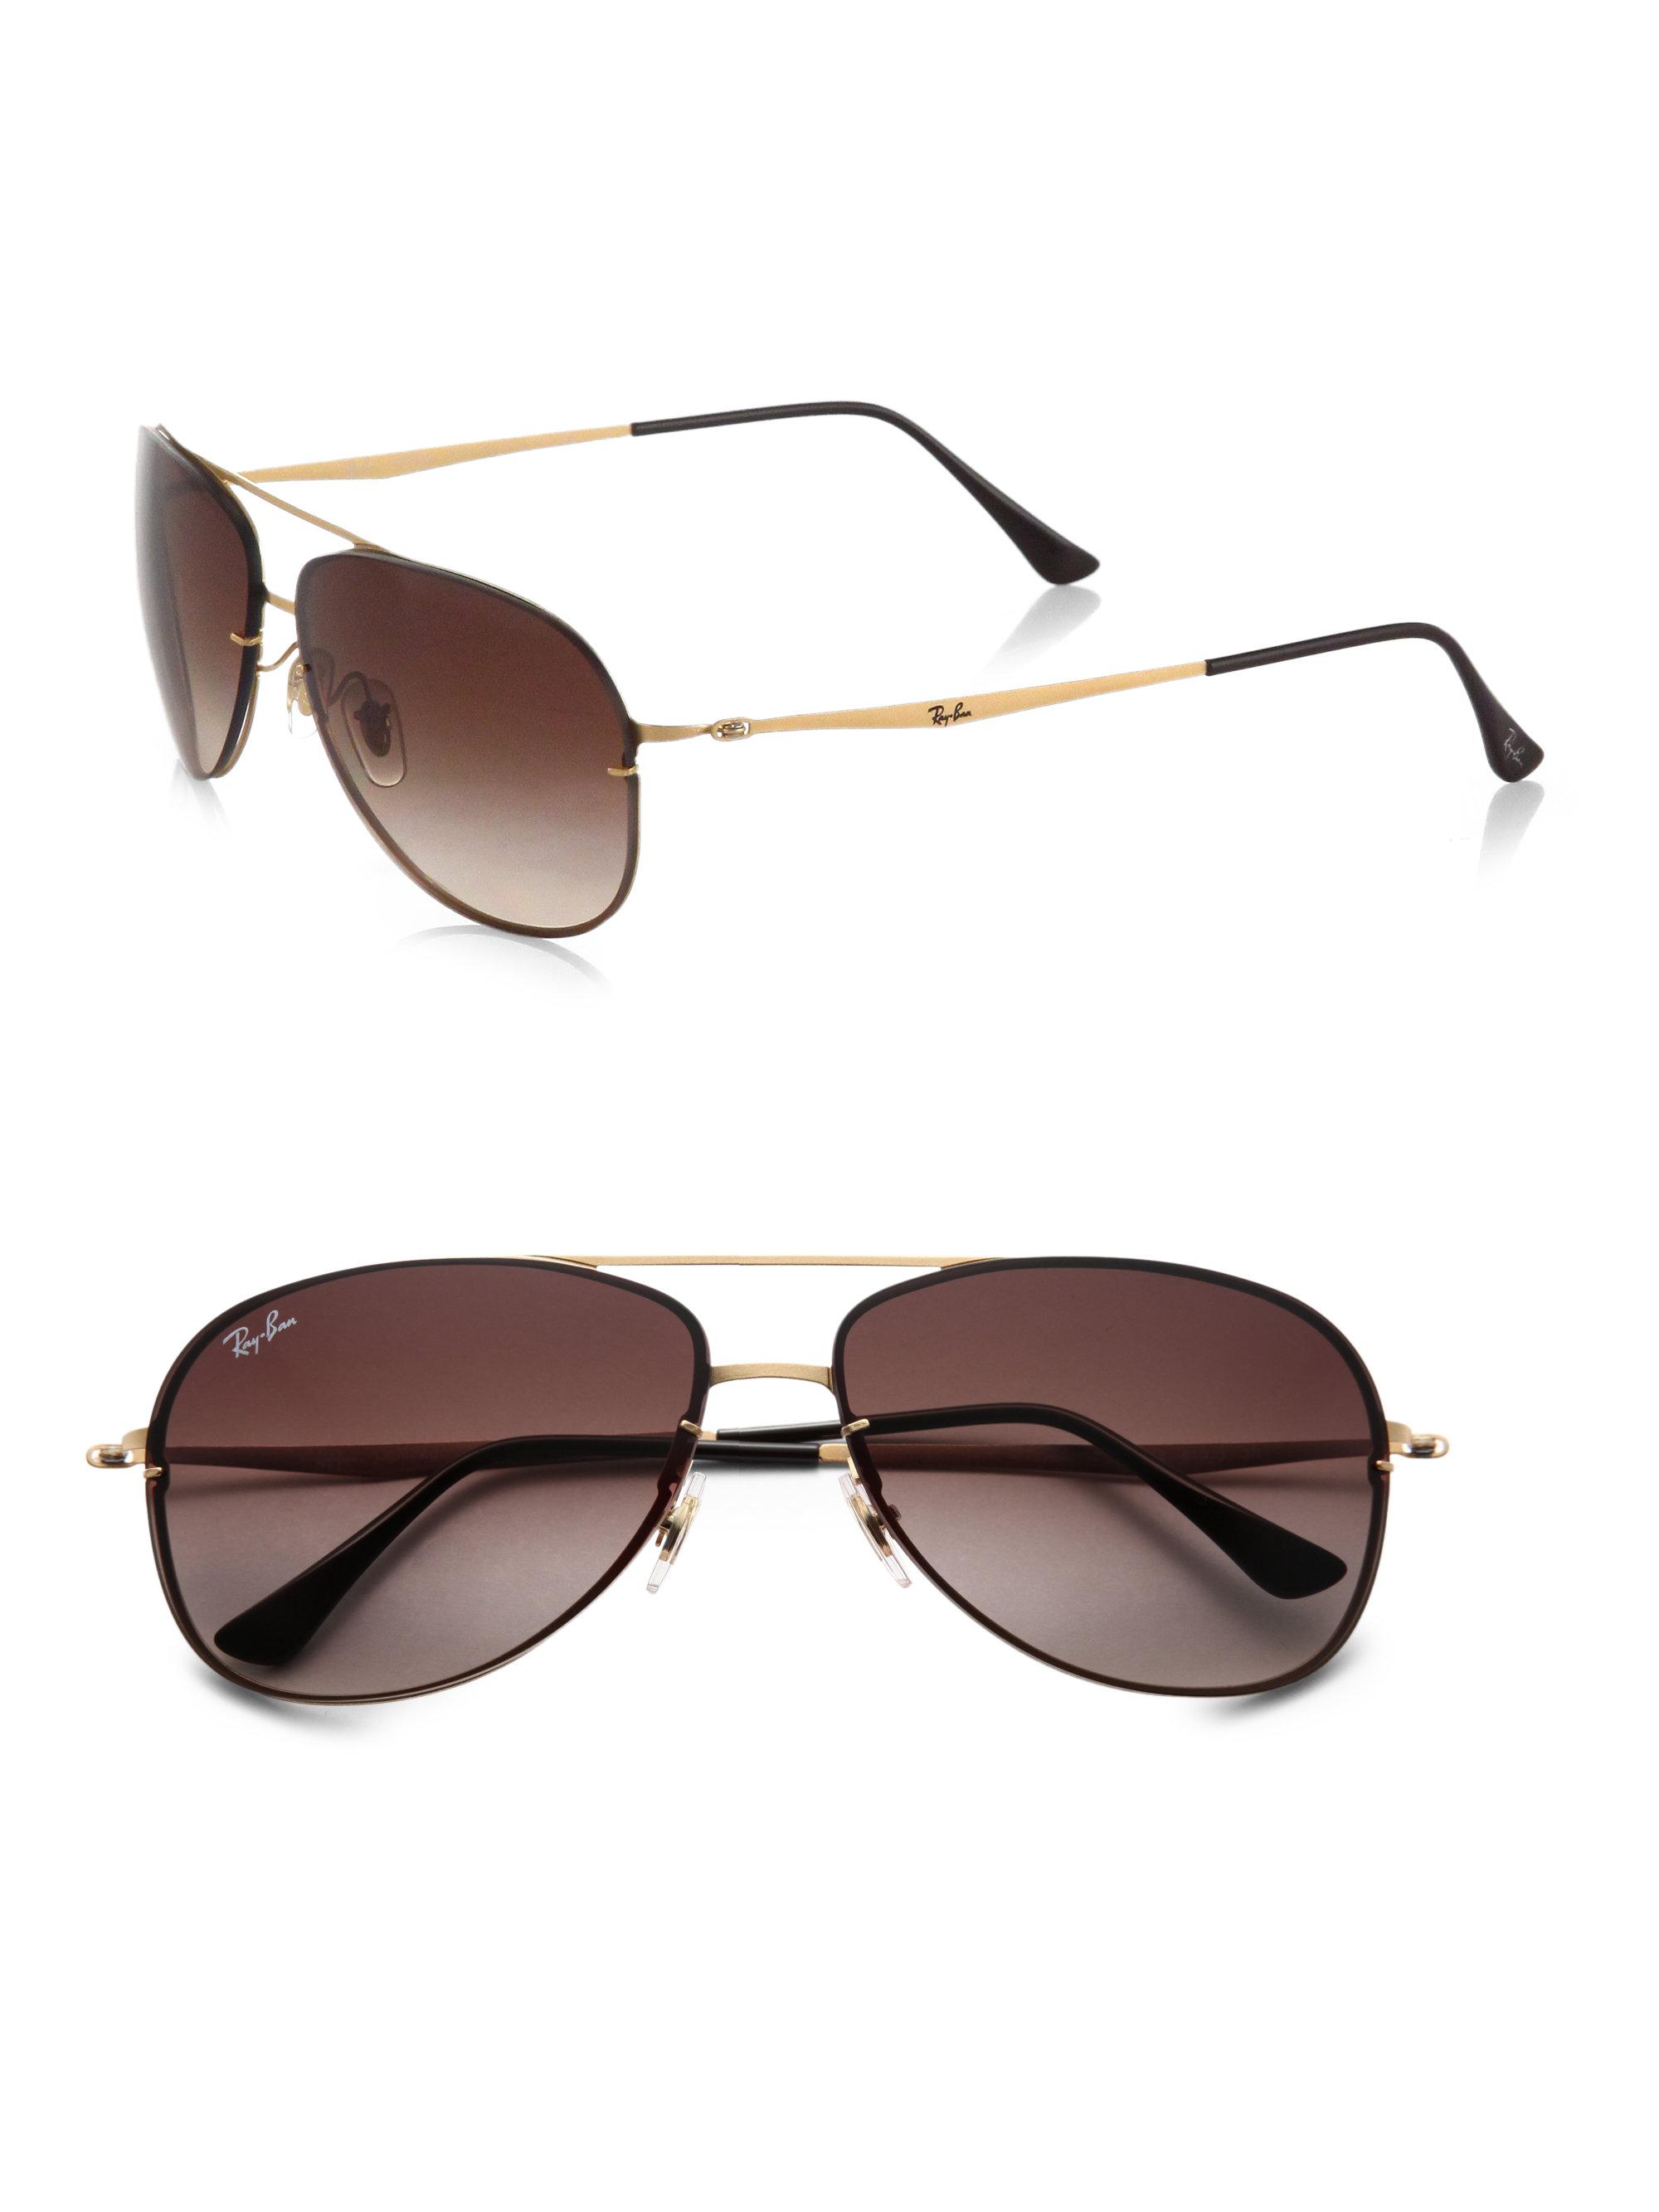 Rimless Aviator Sunglasses : Ray-ban Rimless Aviator Sunglasses in Gold Lyst